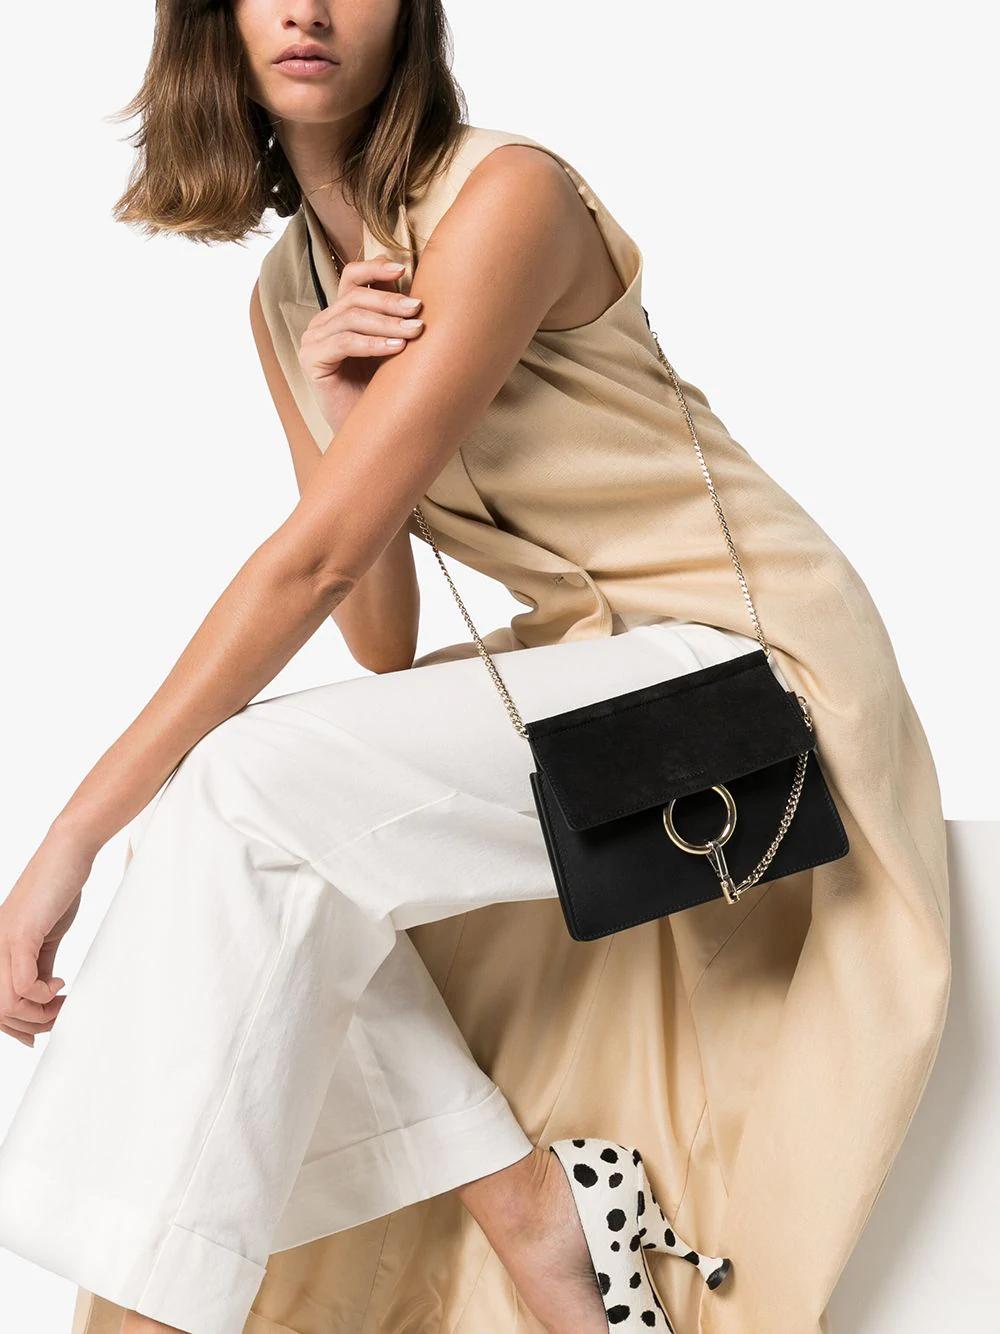 Chloe Mini Faye Chain Bag Farfetch Mini Chain Bag Bags Short Cocktail Dress